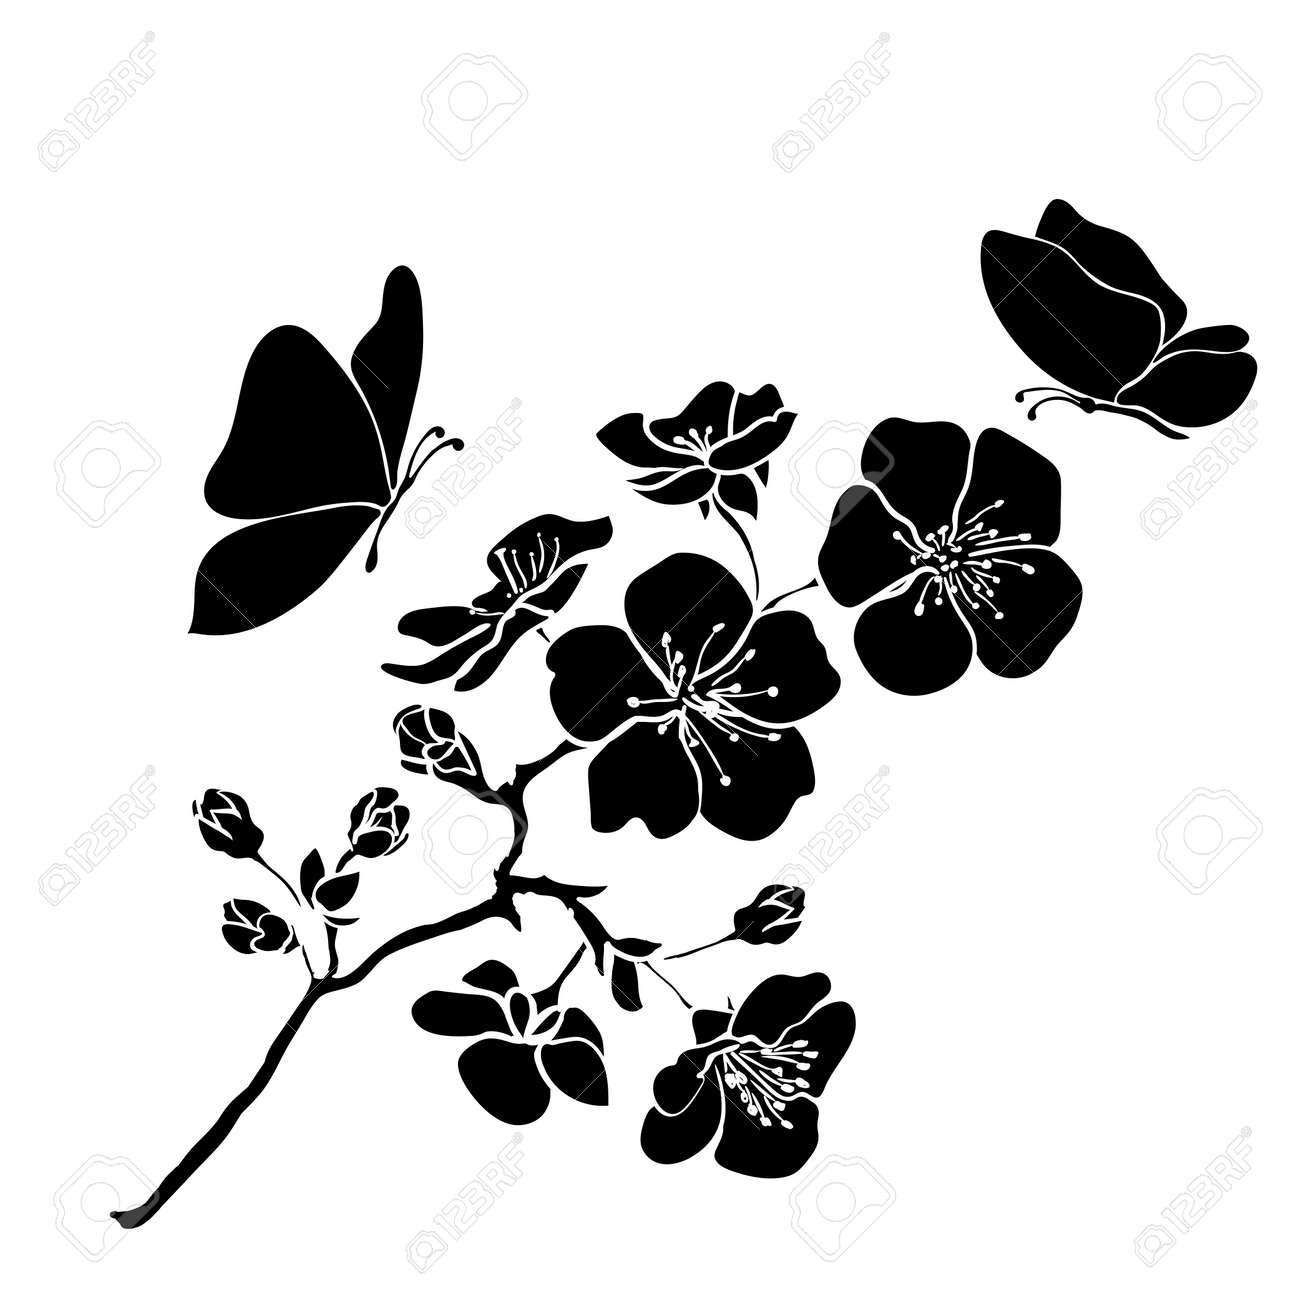 twig sakura blossoms. Vector illustration. Black outline - 37744790